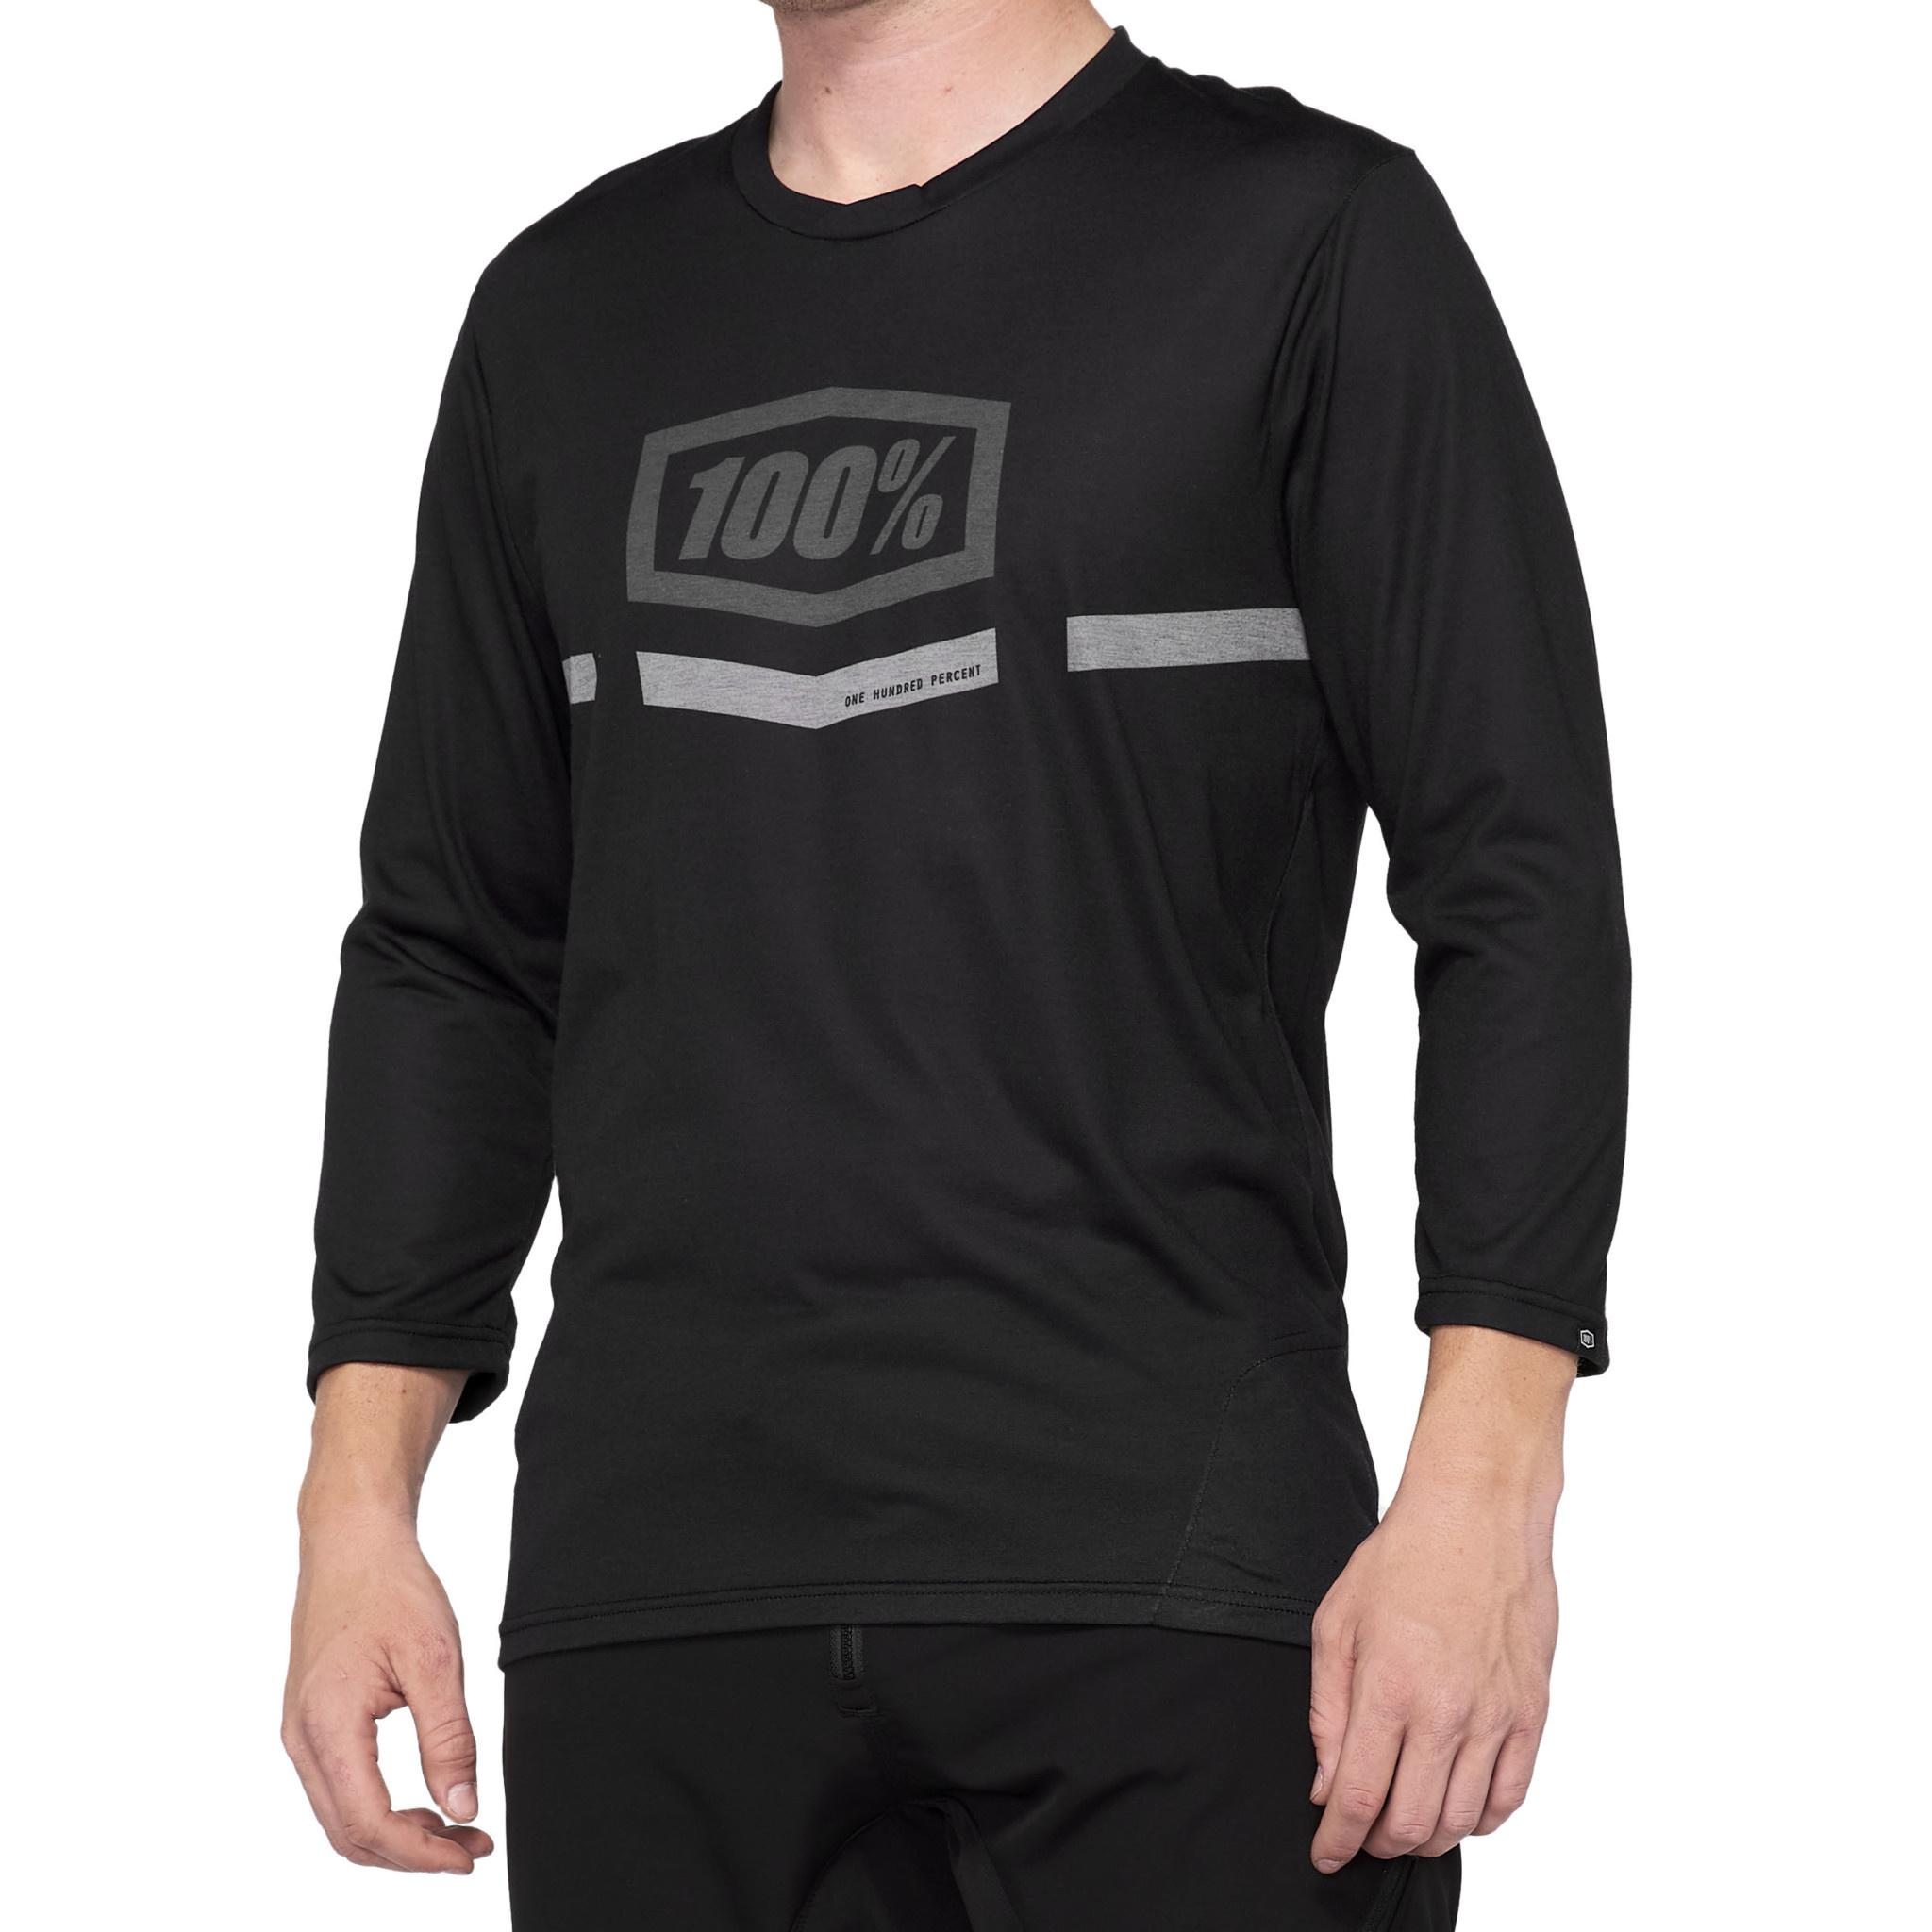 100% Airmatic 3/4 jersey Black-1